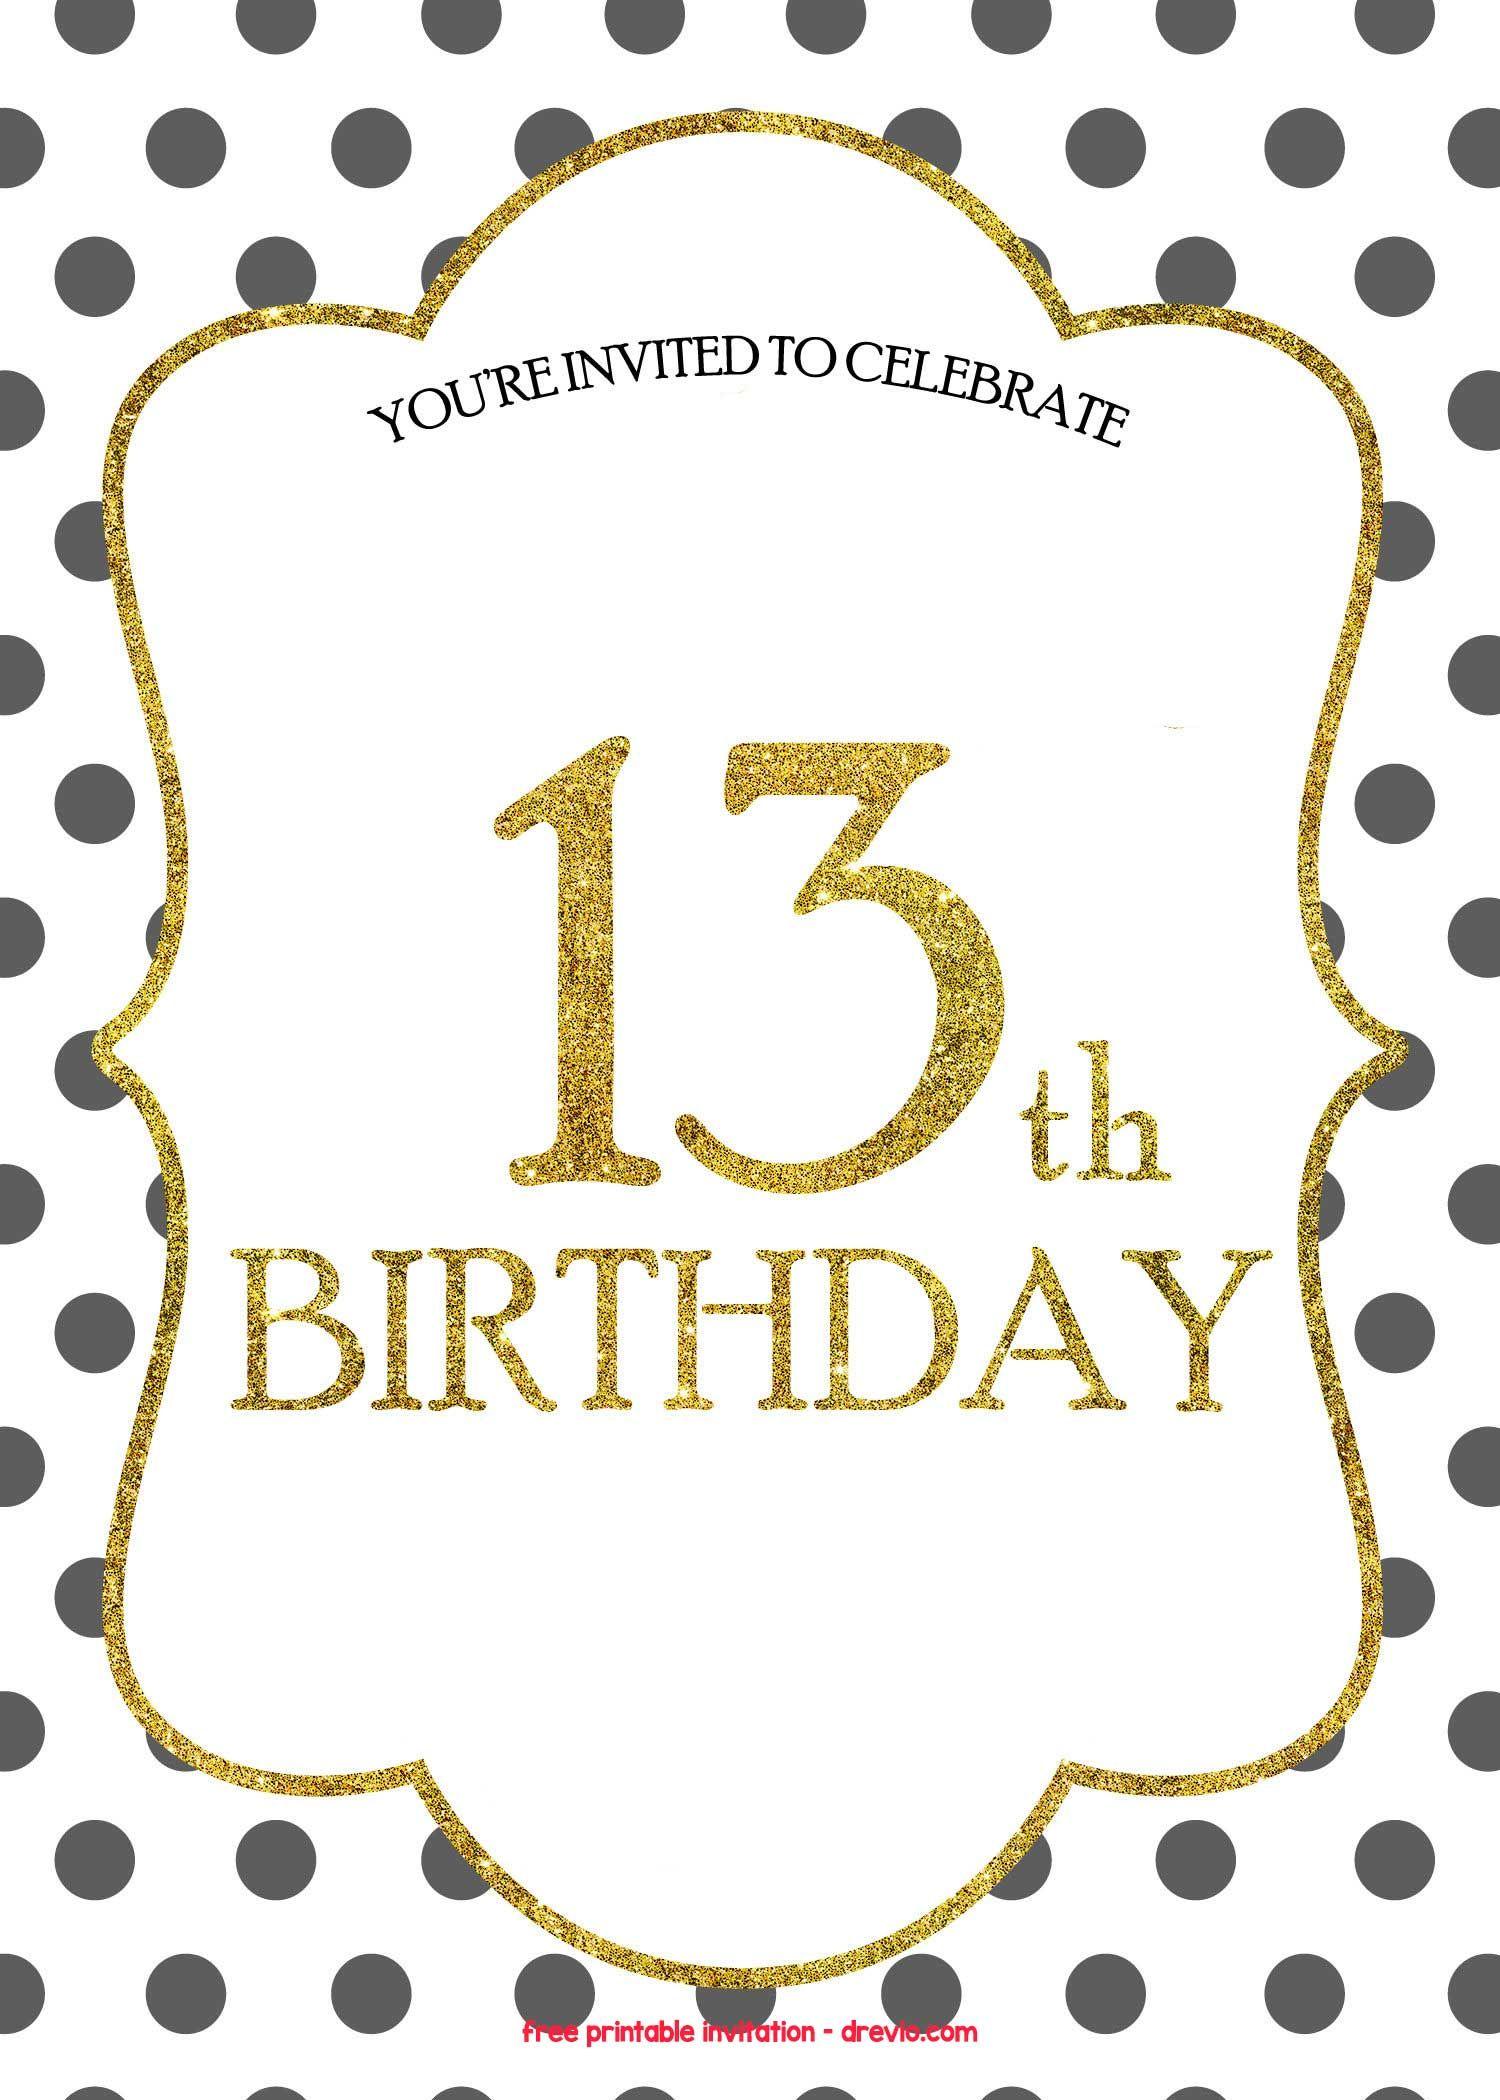 Free 13th Birthday Invitations Templates 13th Birthday Invitations Birthday Party Invitations Printable Printable Birthday Invitations